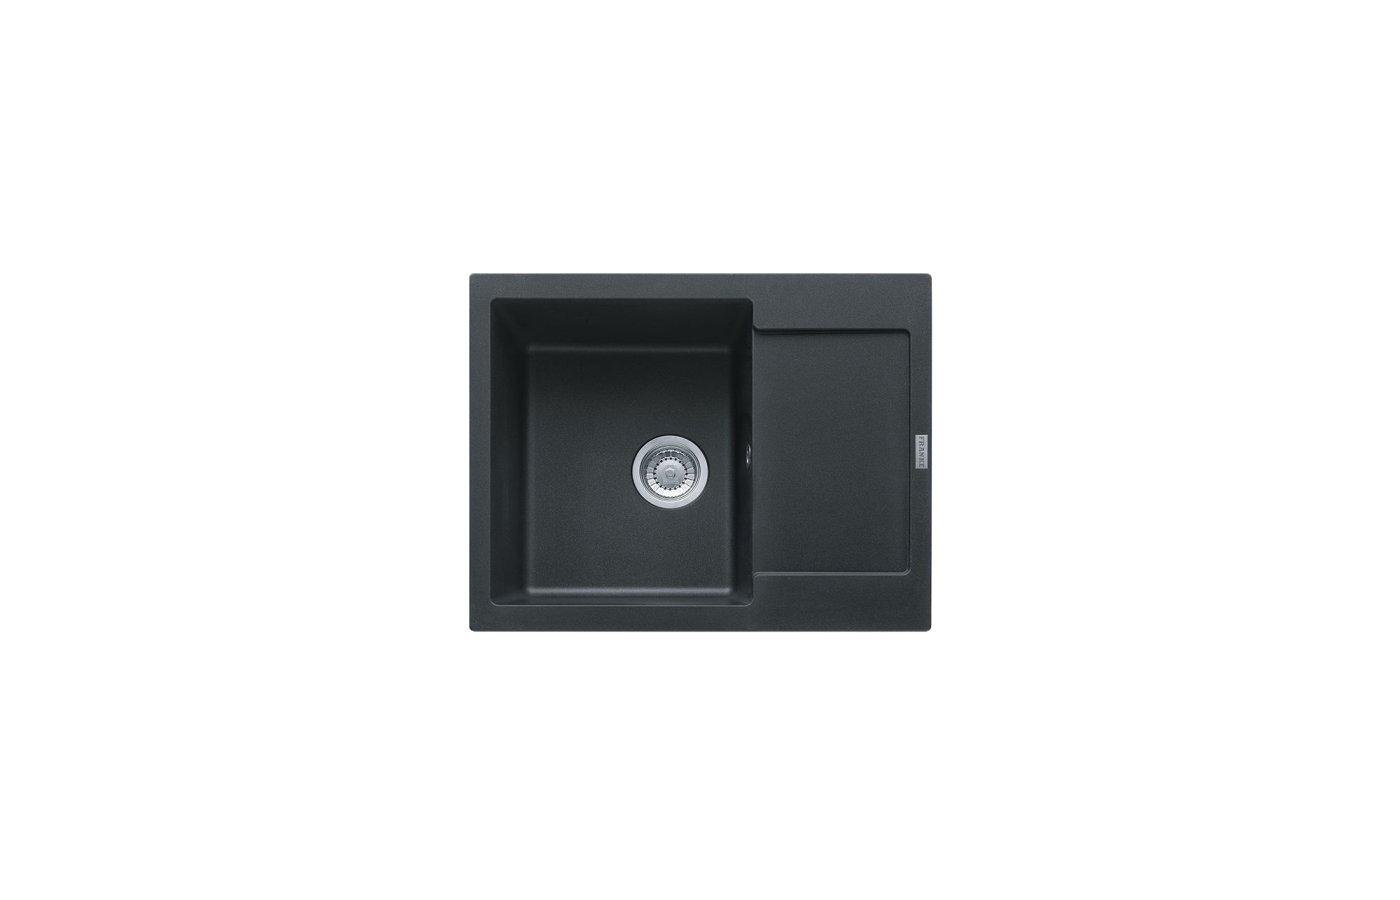 Кухонная мойка FRANKE MRG 611C оникс